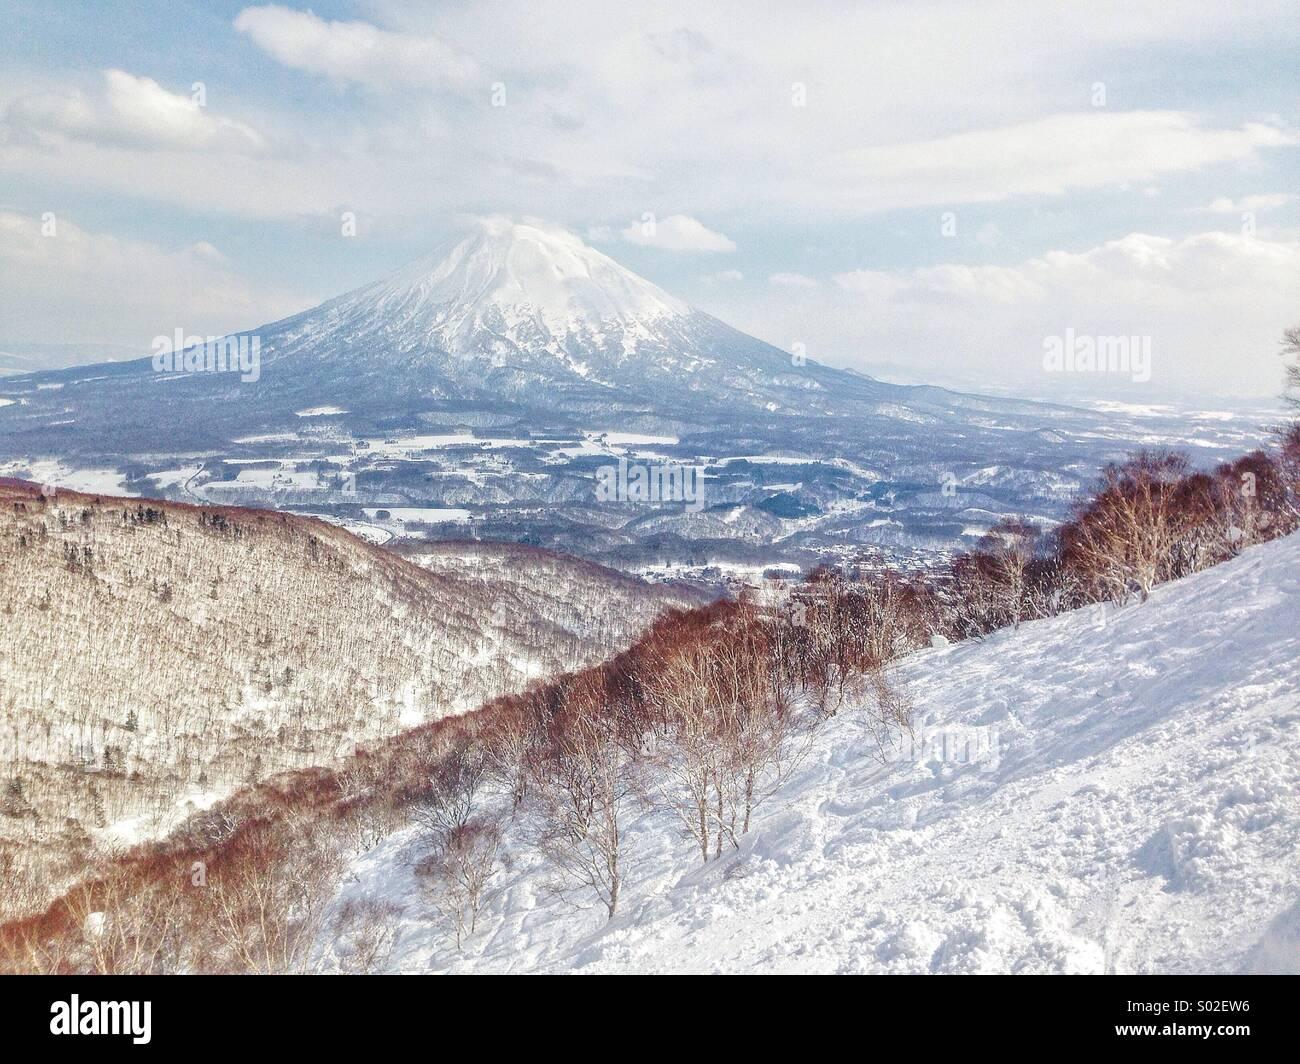 Backcountry with Mt. Yotei. Hokkaido, Japan - Stock Image